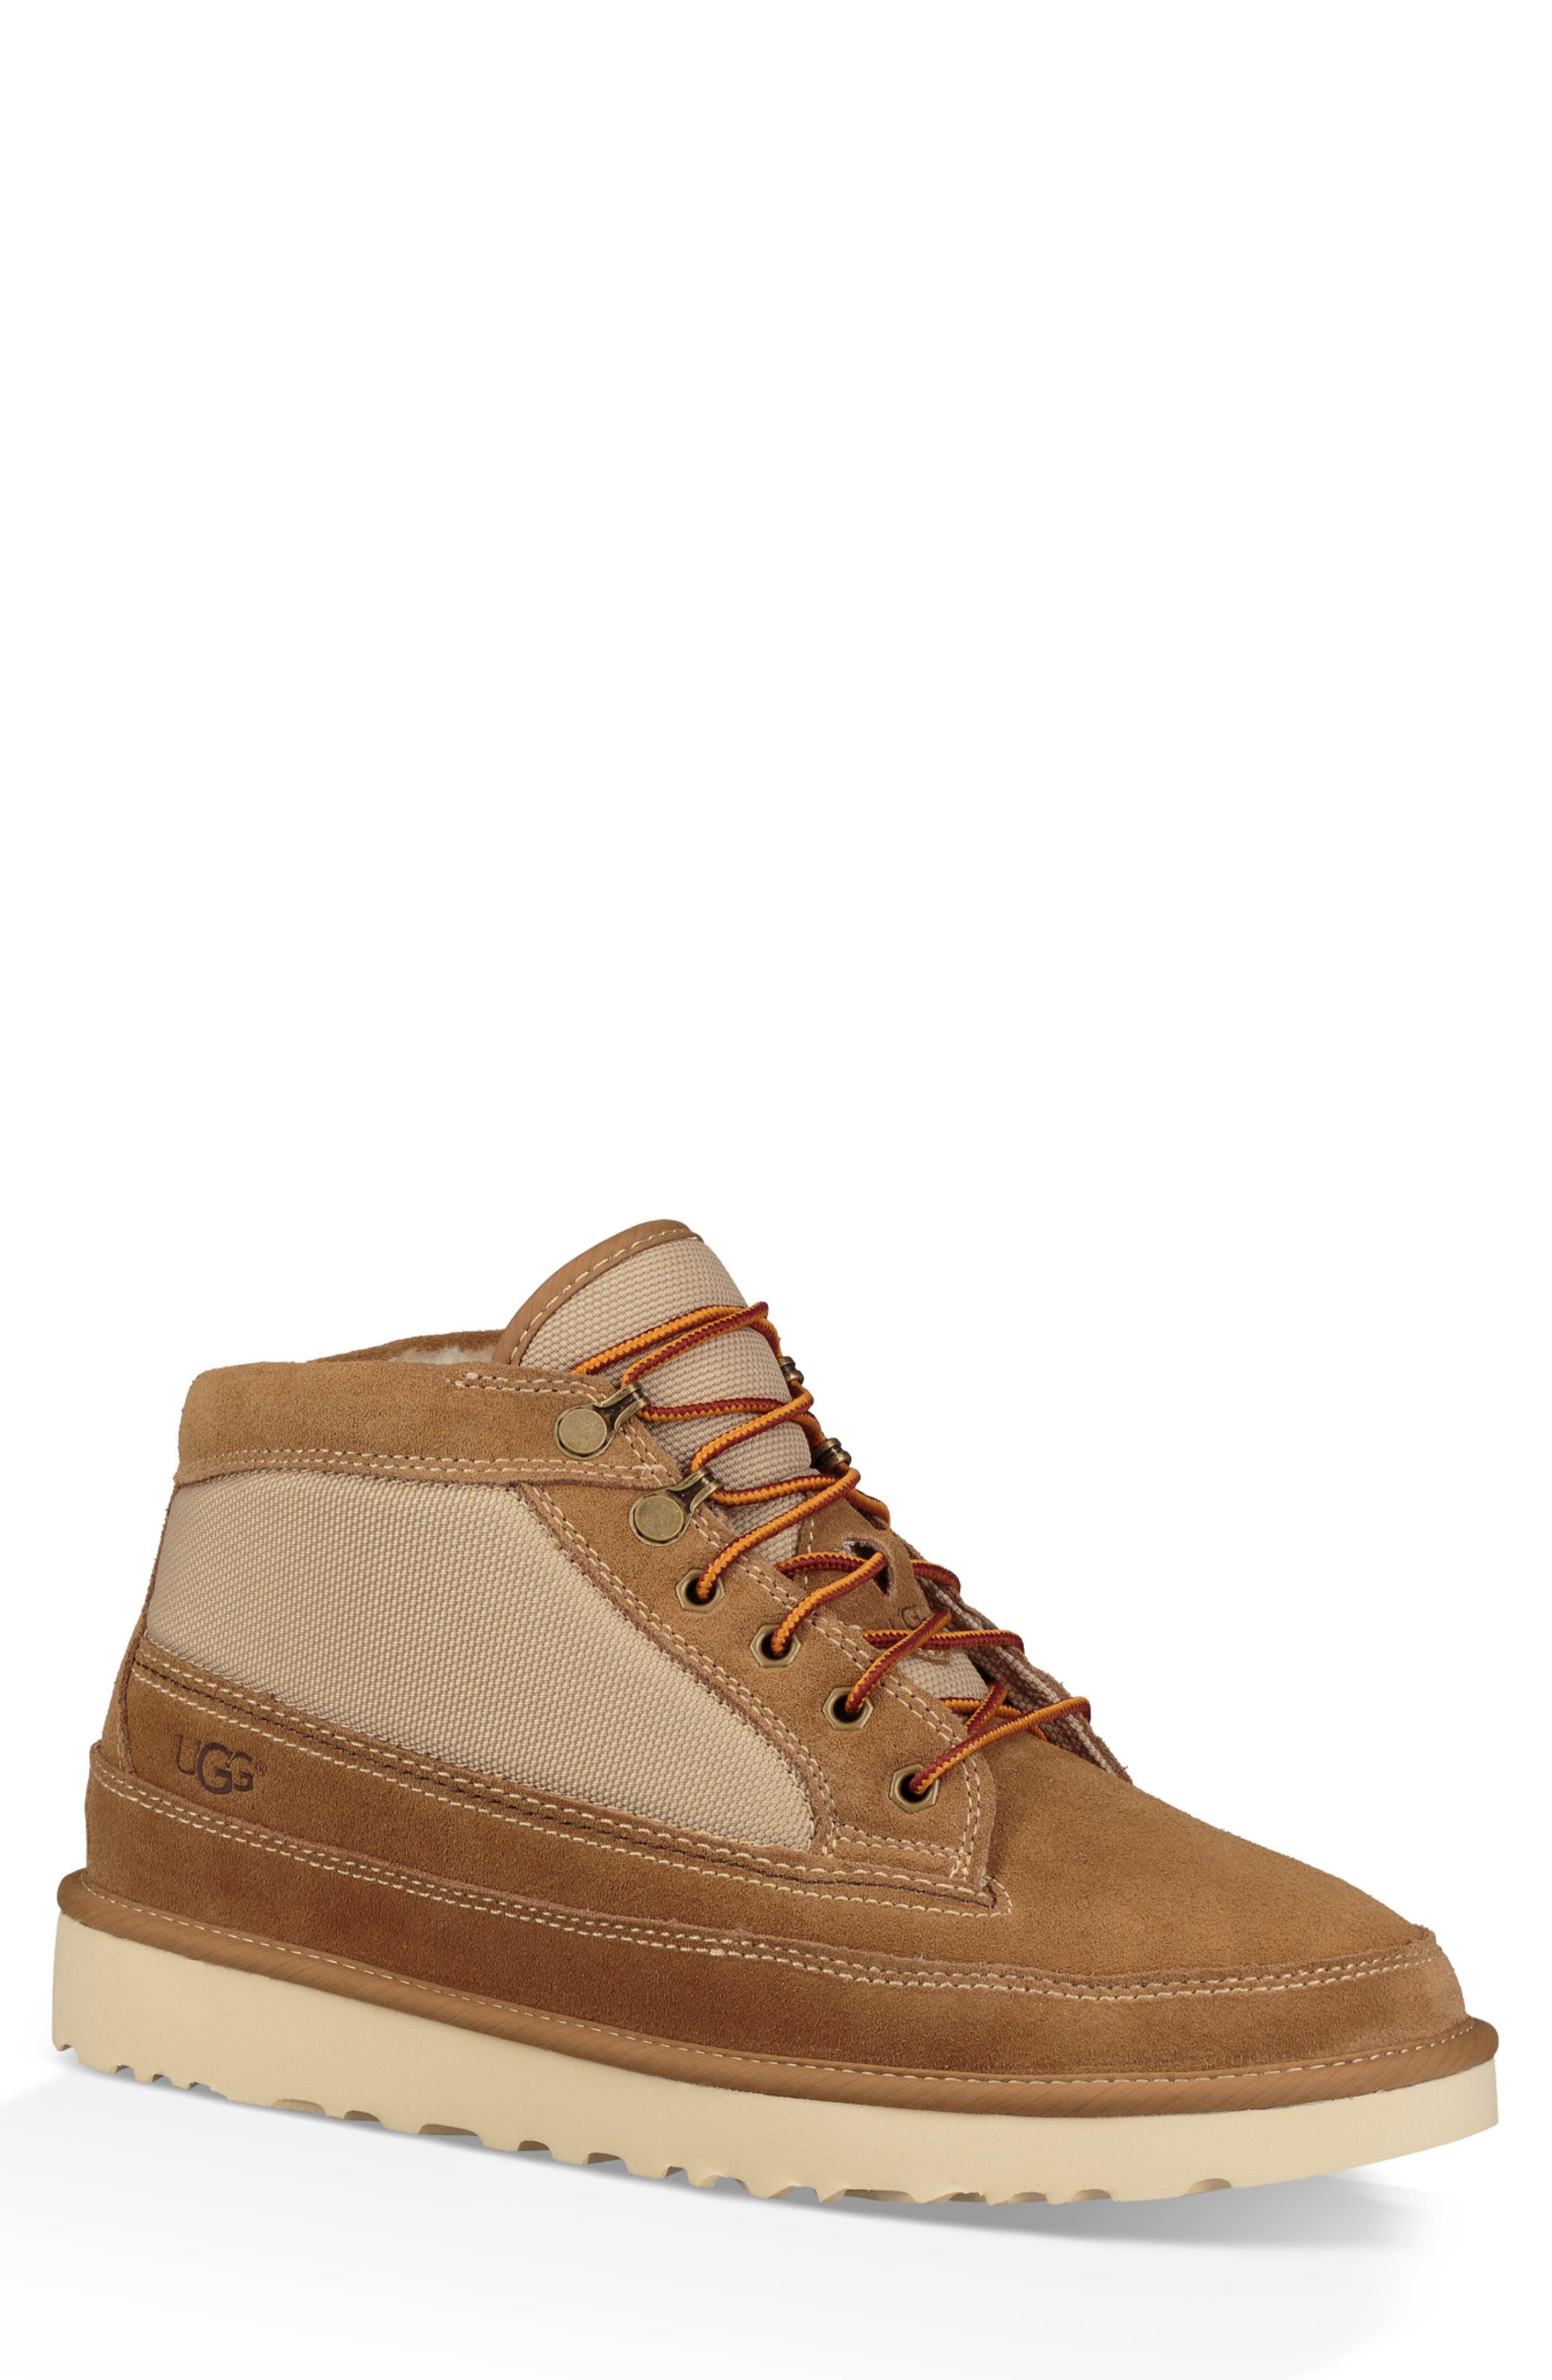 Ugg Highland Field Boot, Brown